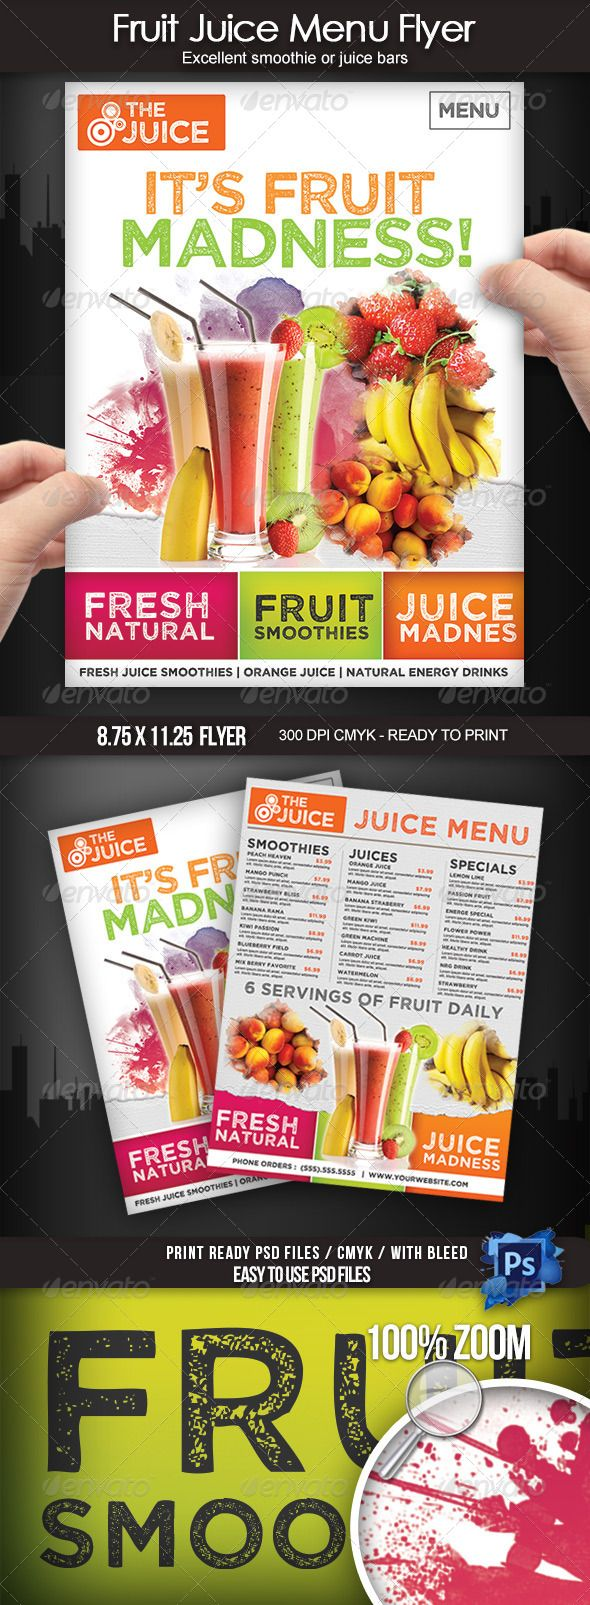 Fruit Juice Menu Flyer Juice Menu Fruit Displays Fruit Shop